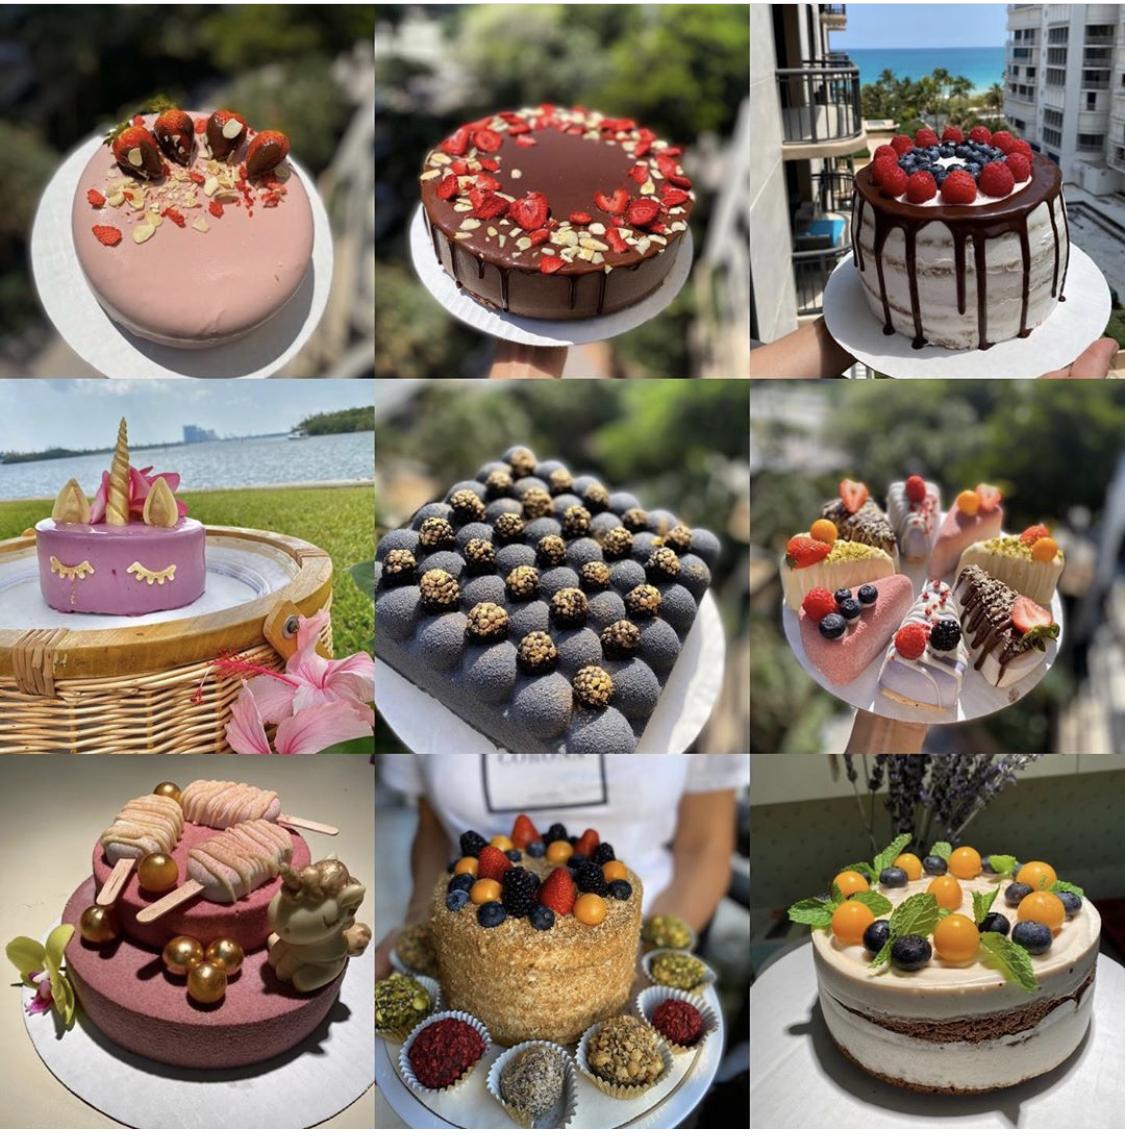 Anyes Raw Candy - vegan Miami, Florida amazing special occasion birthday cake